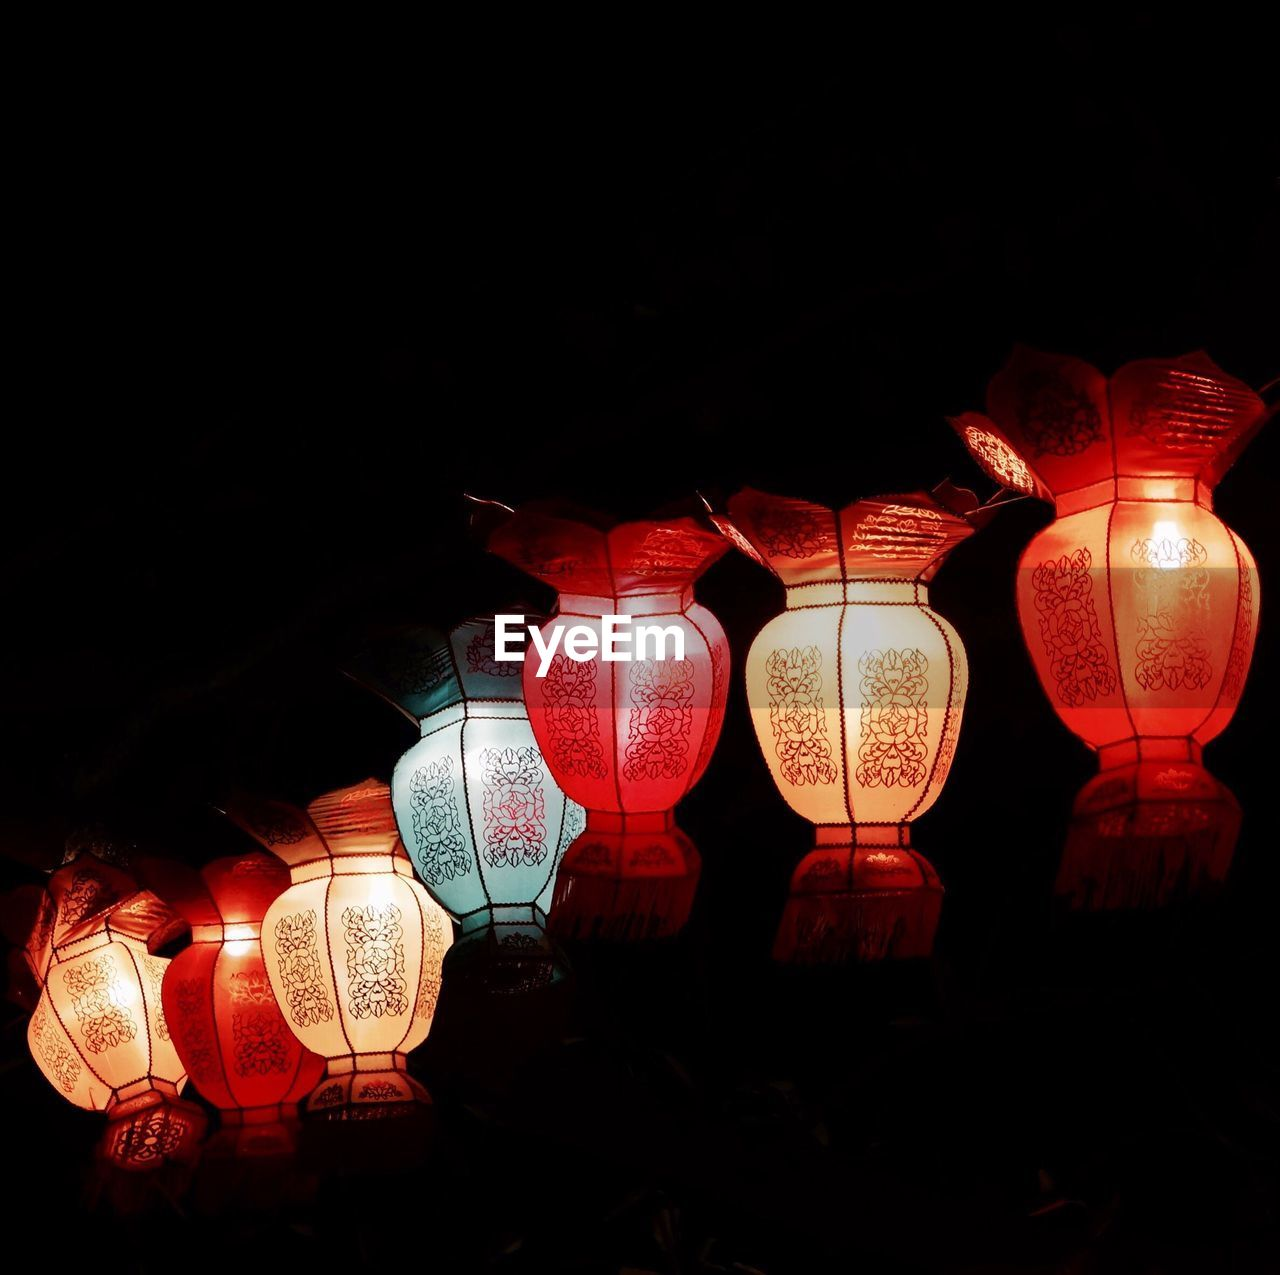 lighting equipment, illuminated, lantern, hanging, chinese lantern, night, decoration, paper lantern, celebration, chinese lantern festival, no people, cultures, chinese new year, red, low angle view, indoors